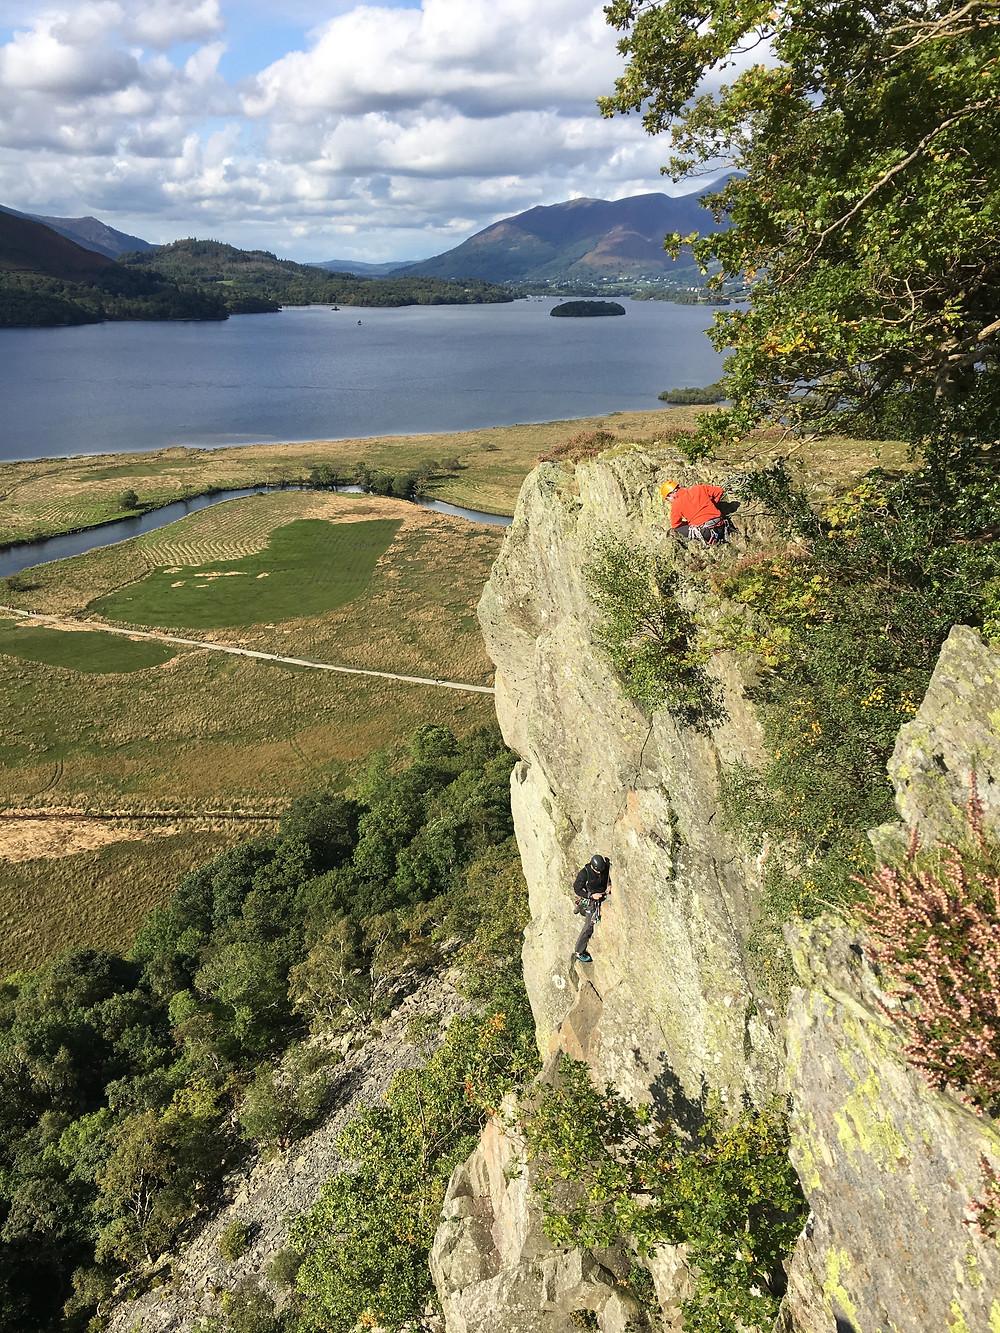 Rock climbing in Borrowdale for work!